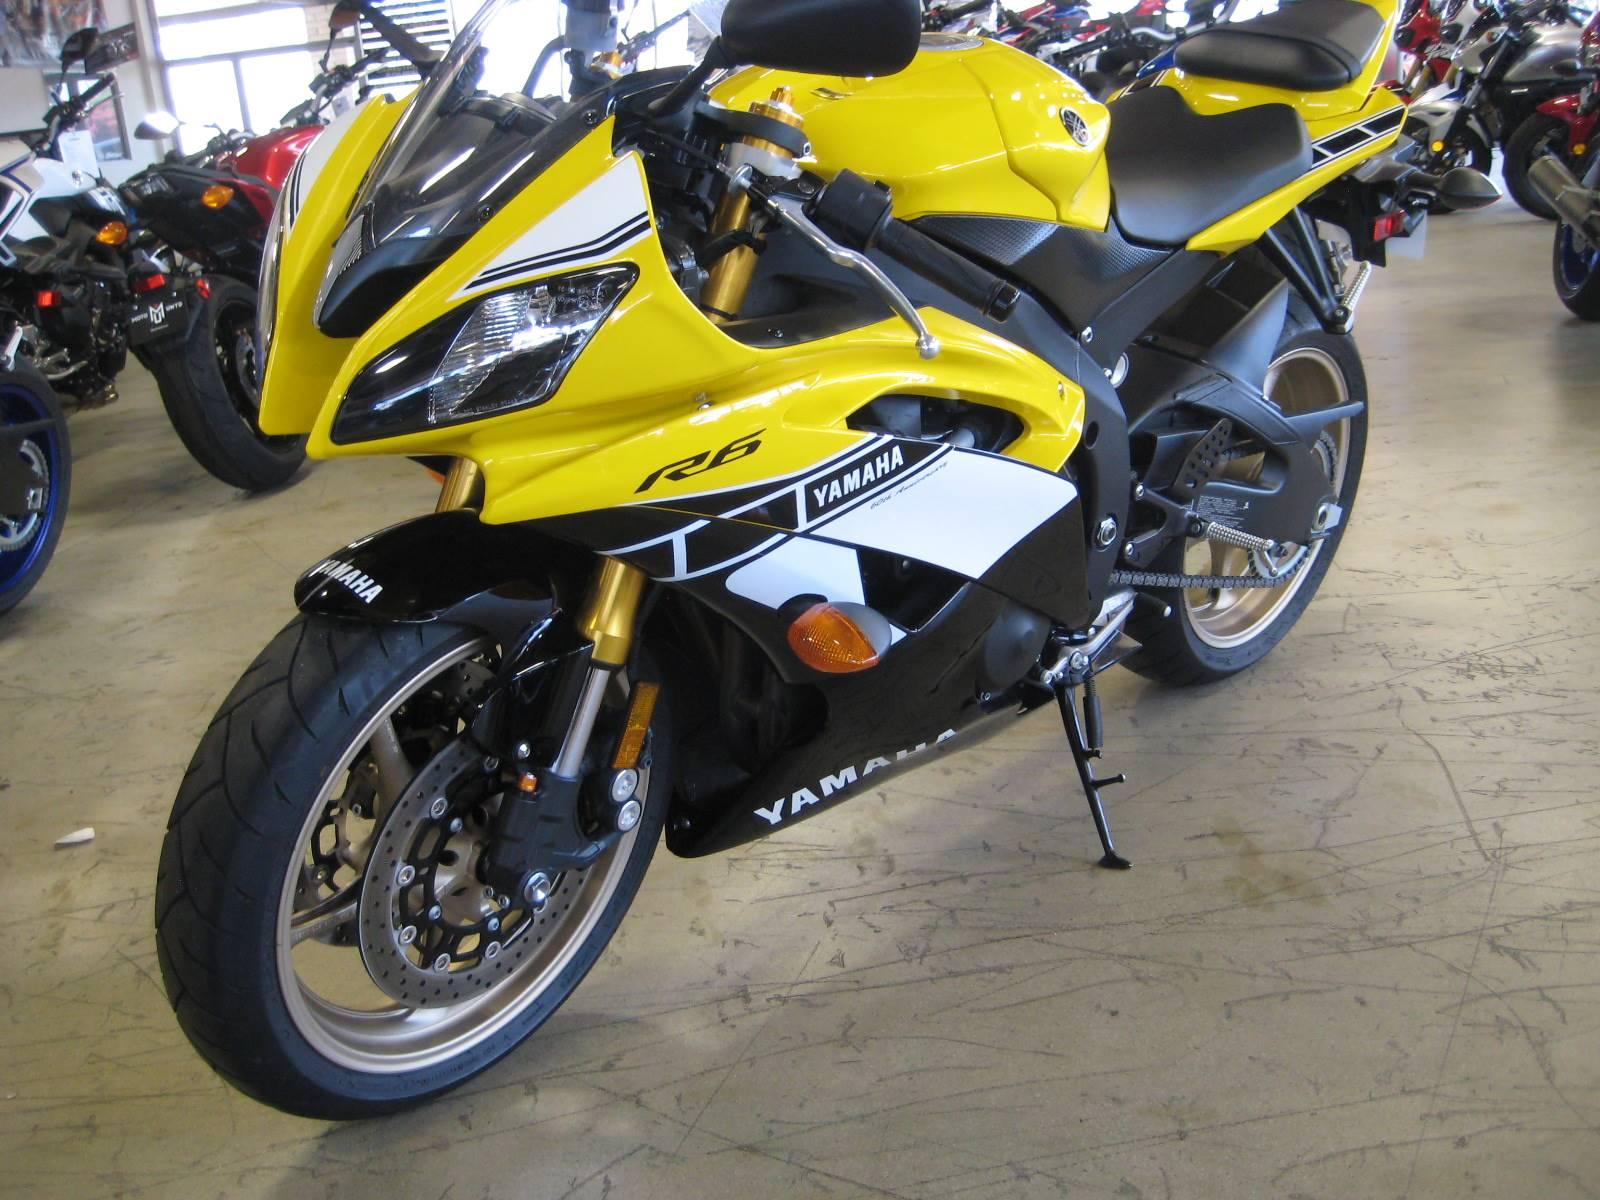 2016 Yamaha YZF-R6 for sale 16355